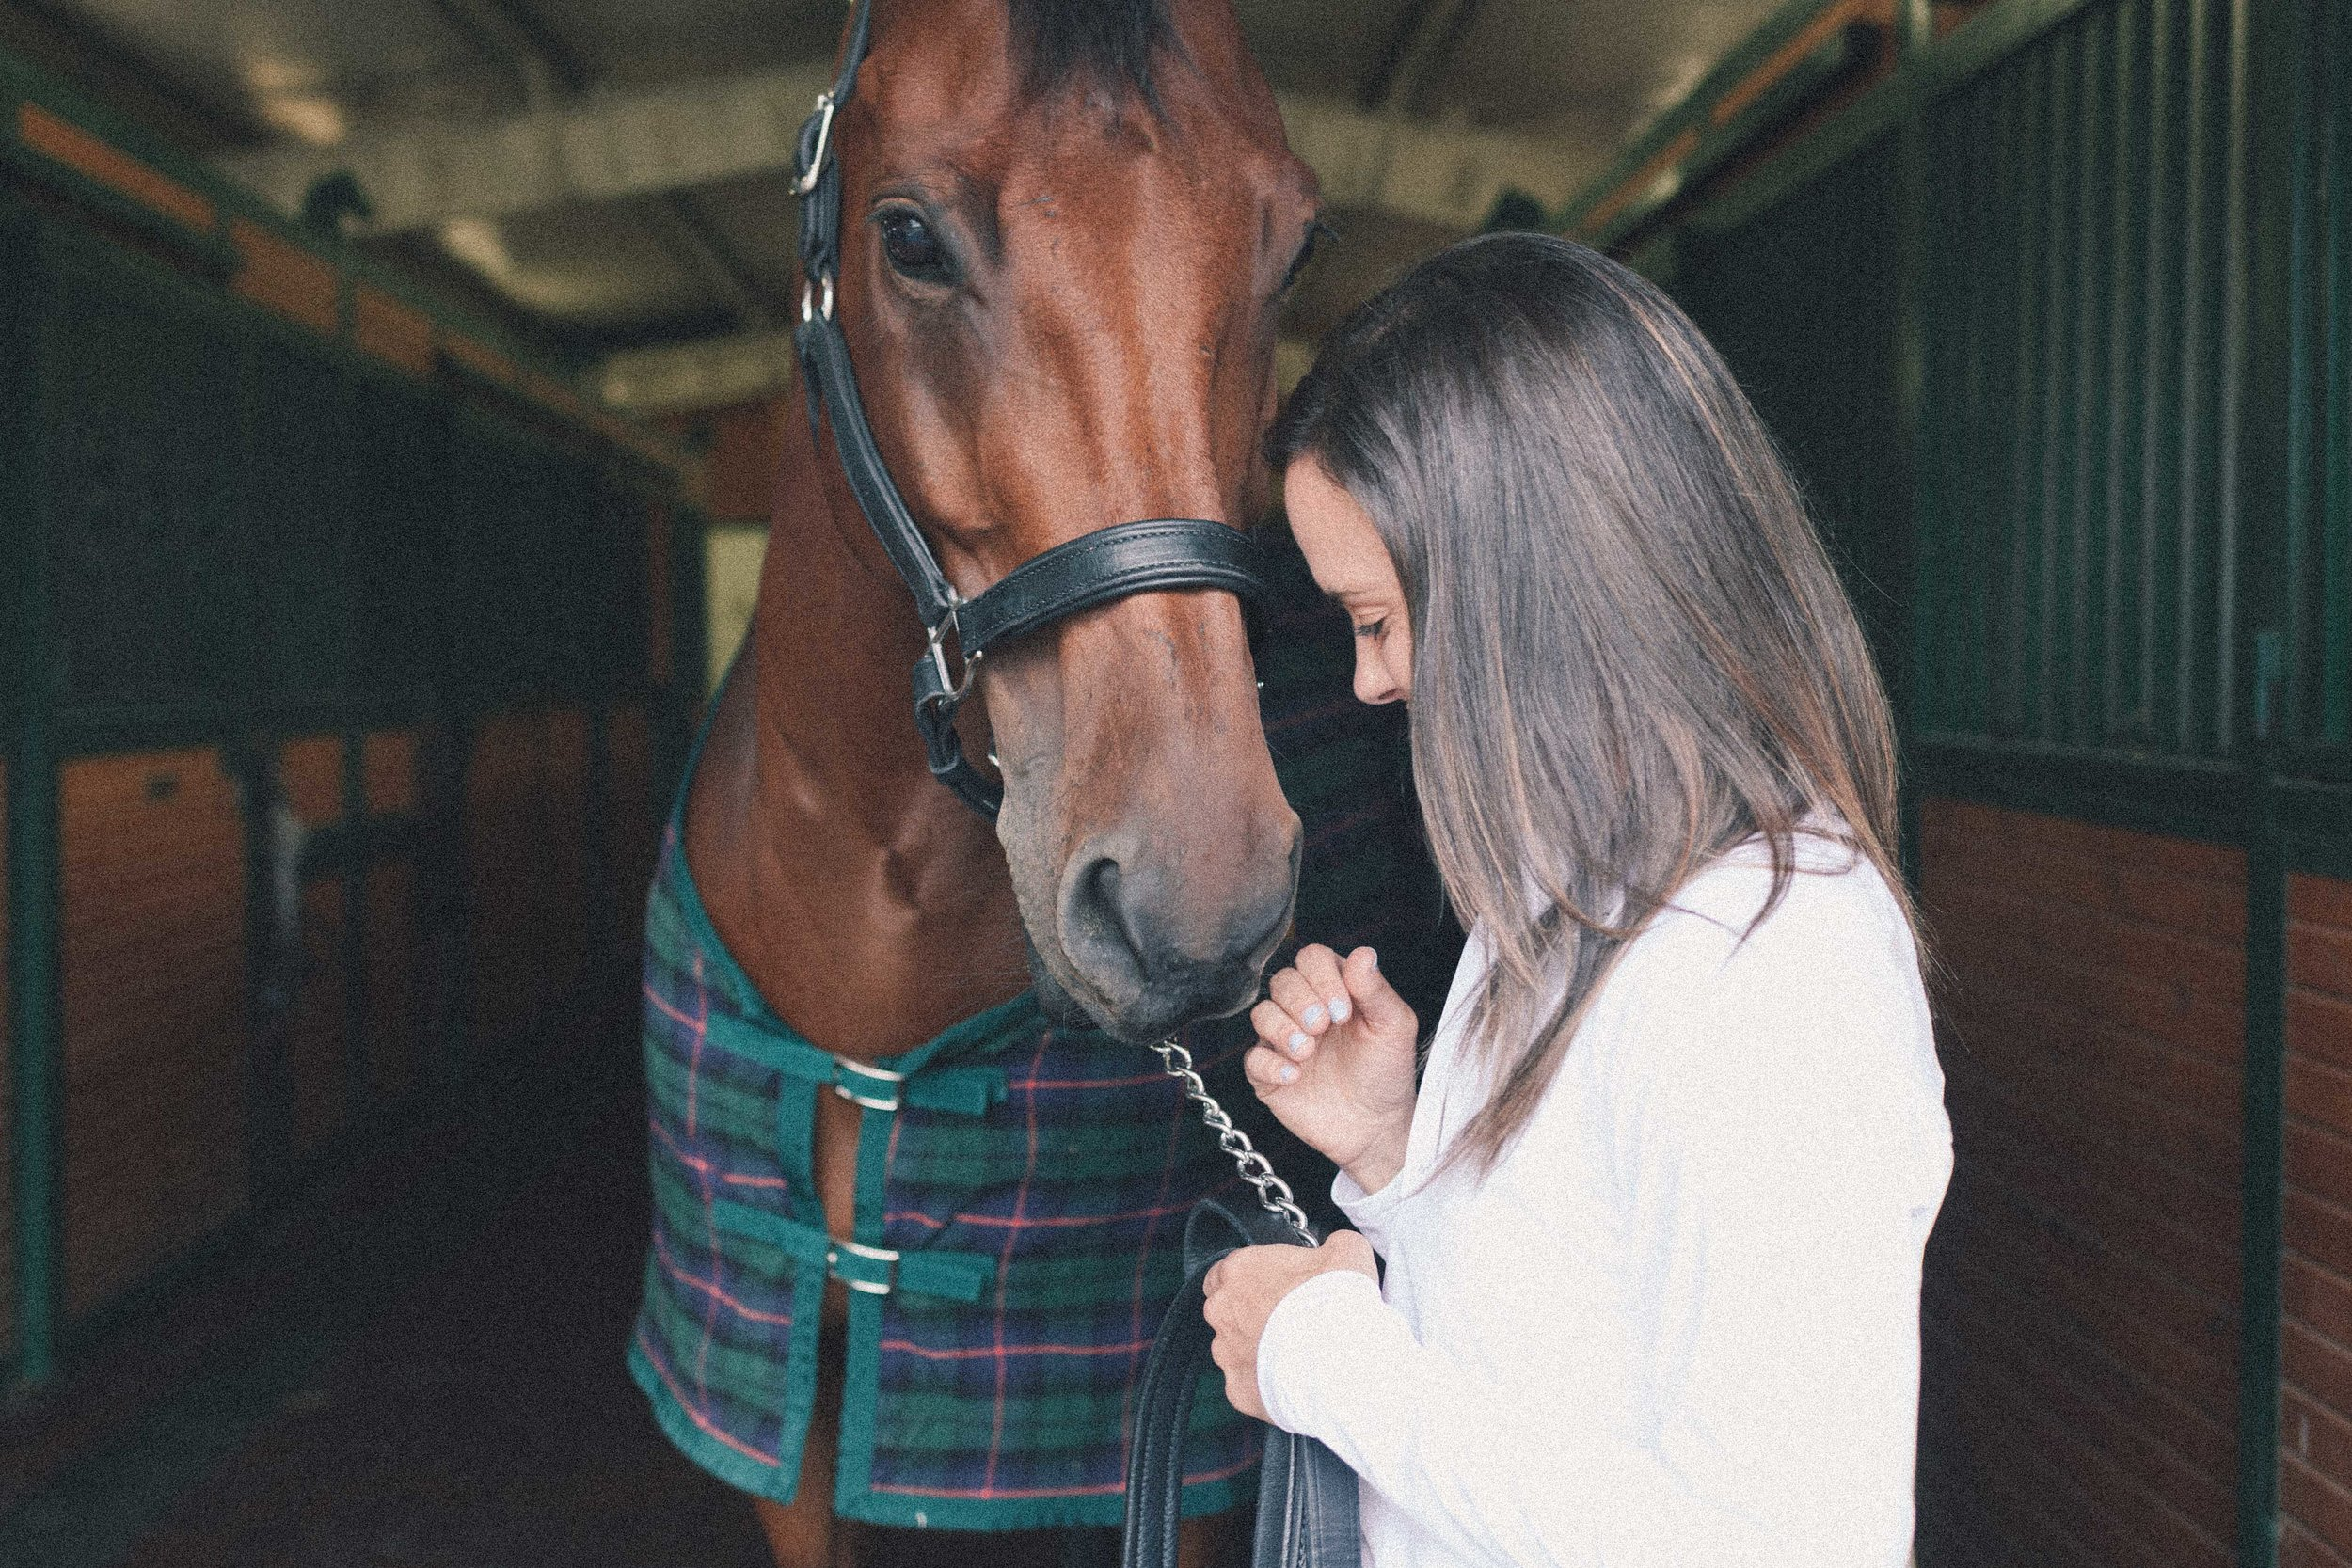 Colorado-Lifestyle-Photography-Jimena-Peck-Horse-Yoga-Mind-Body-Horse